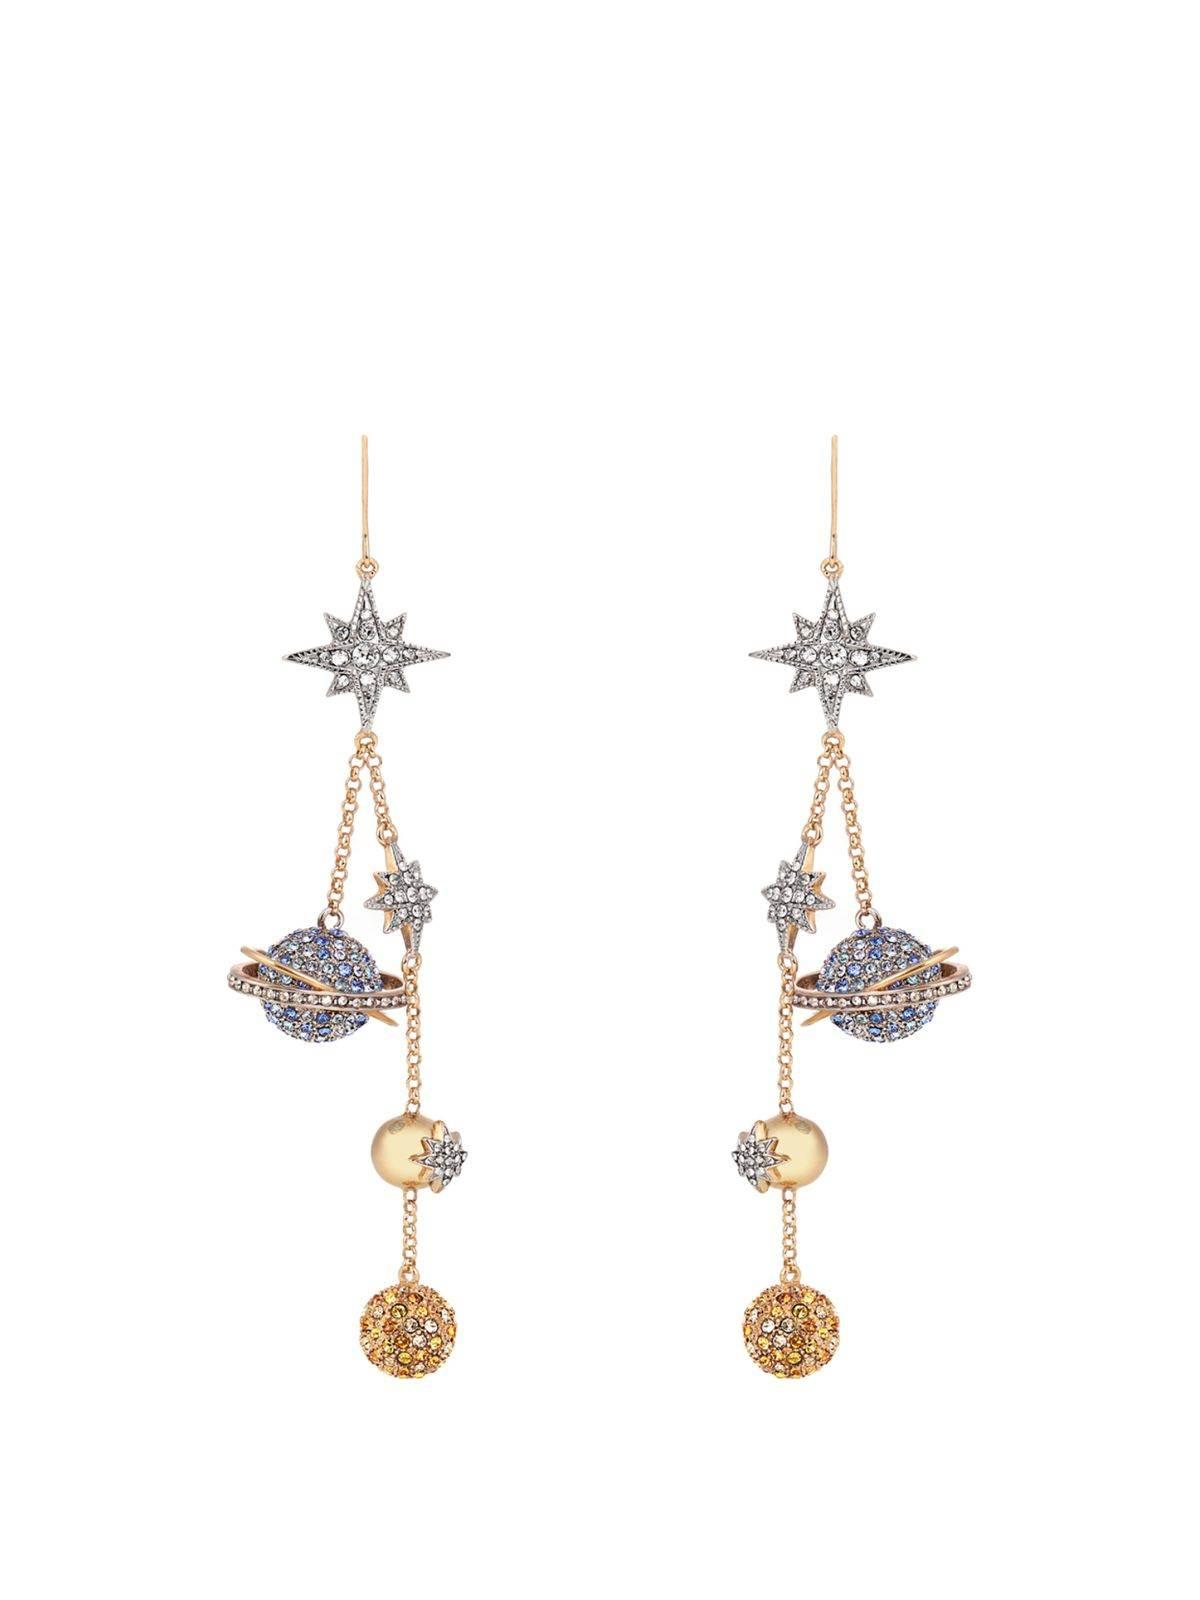 beautiful jewelry diy-3659243426976011